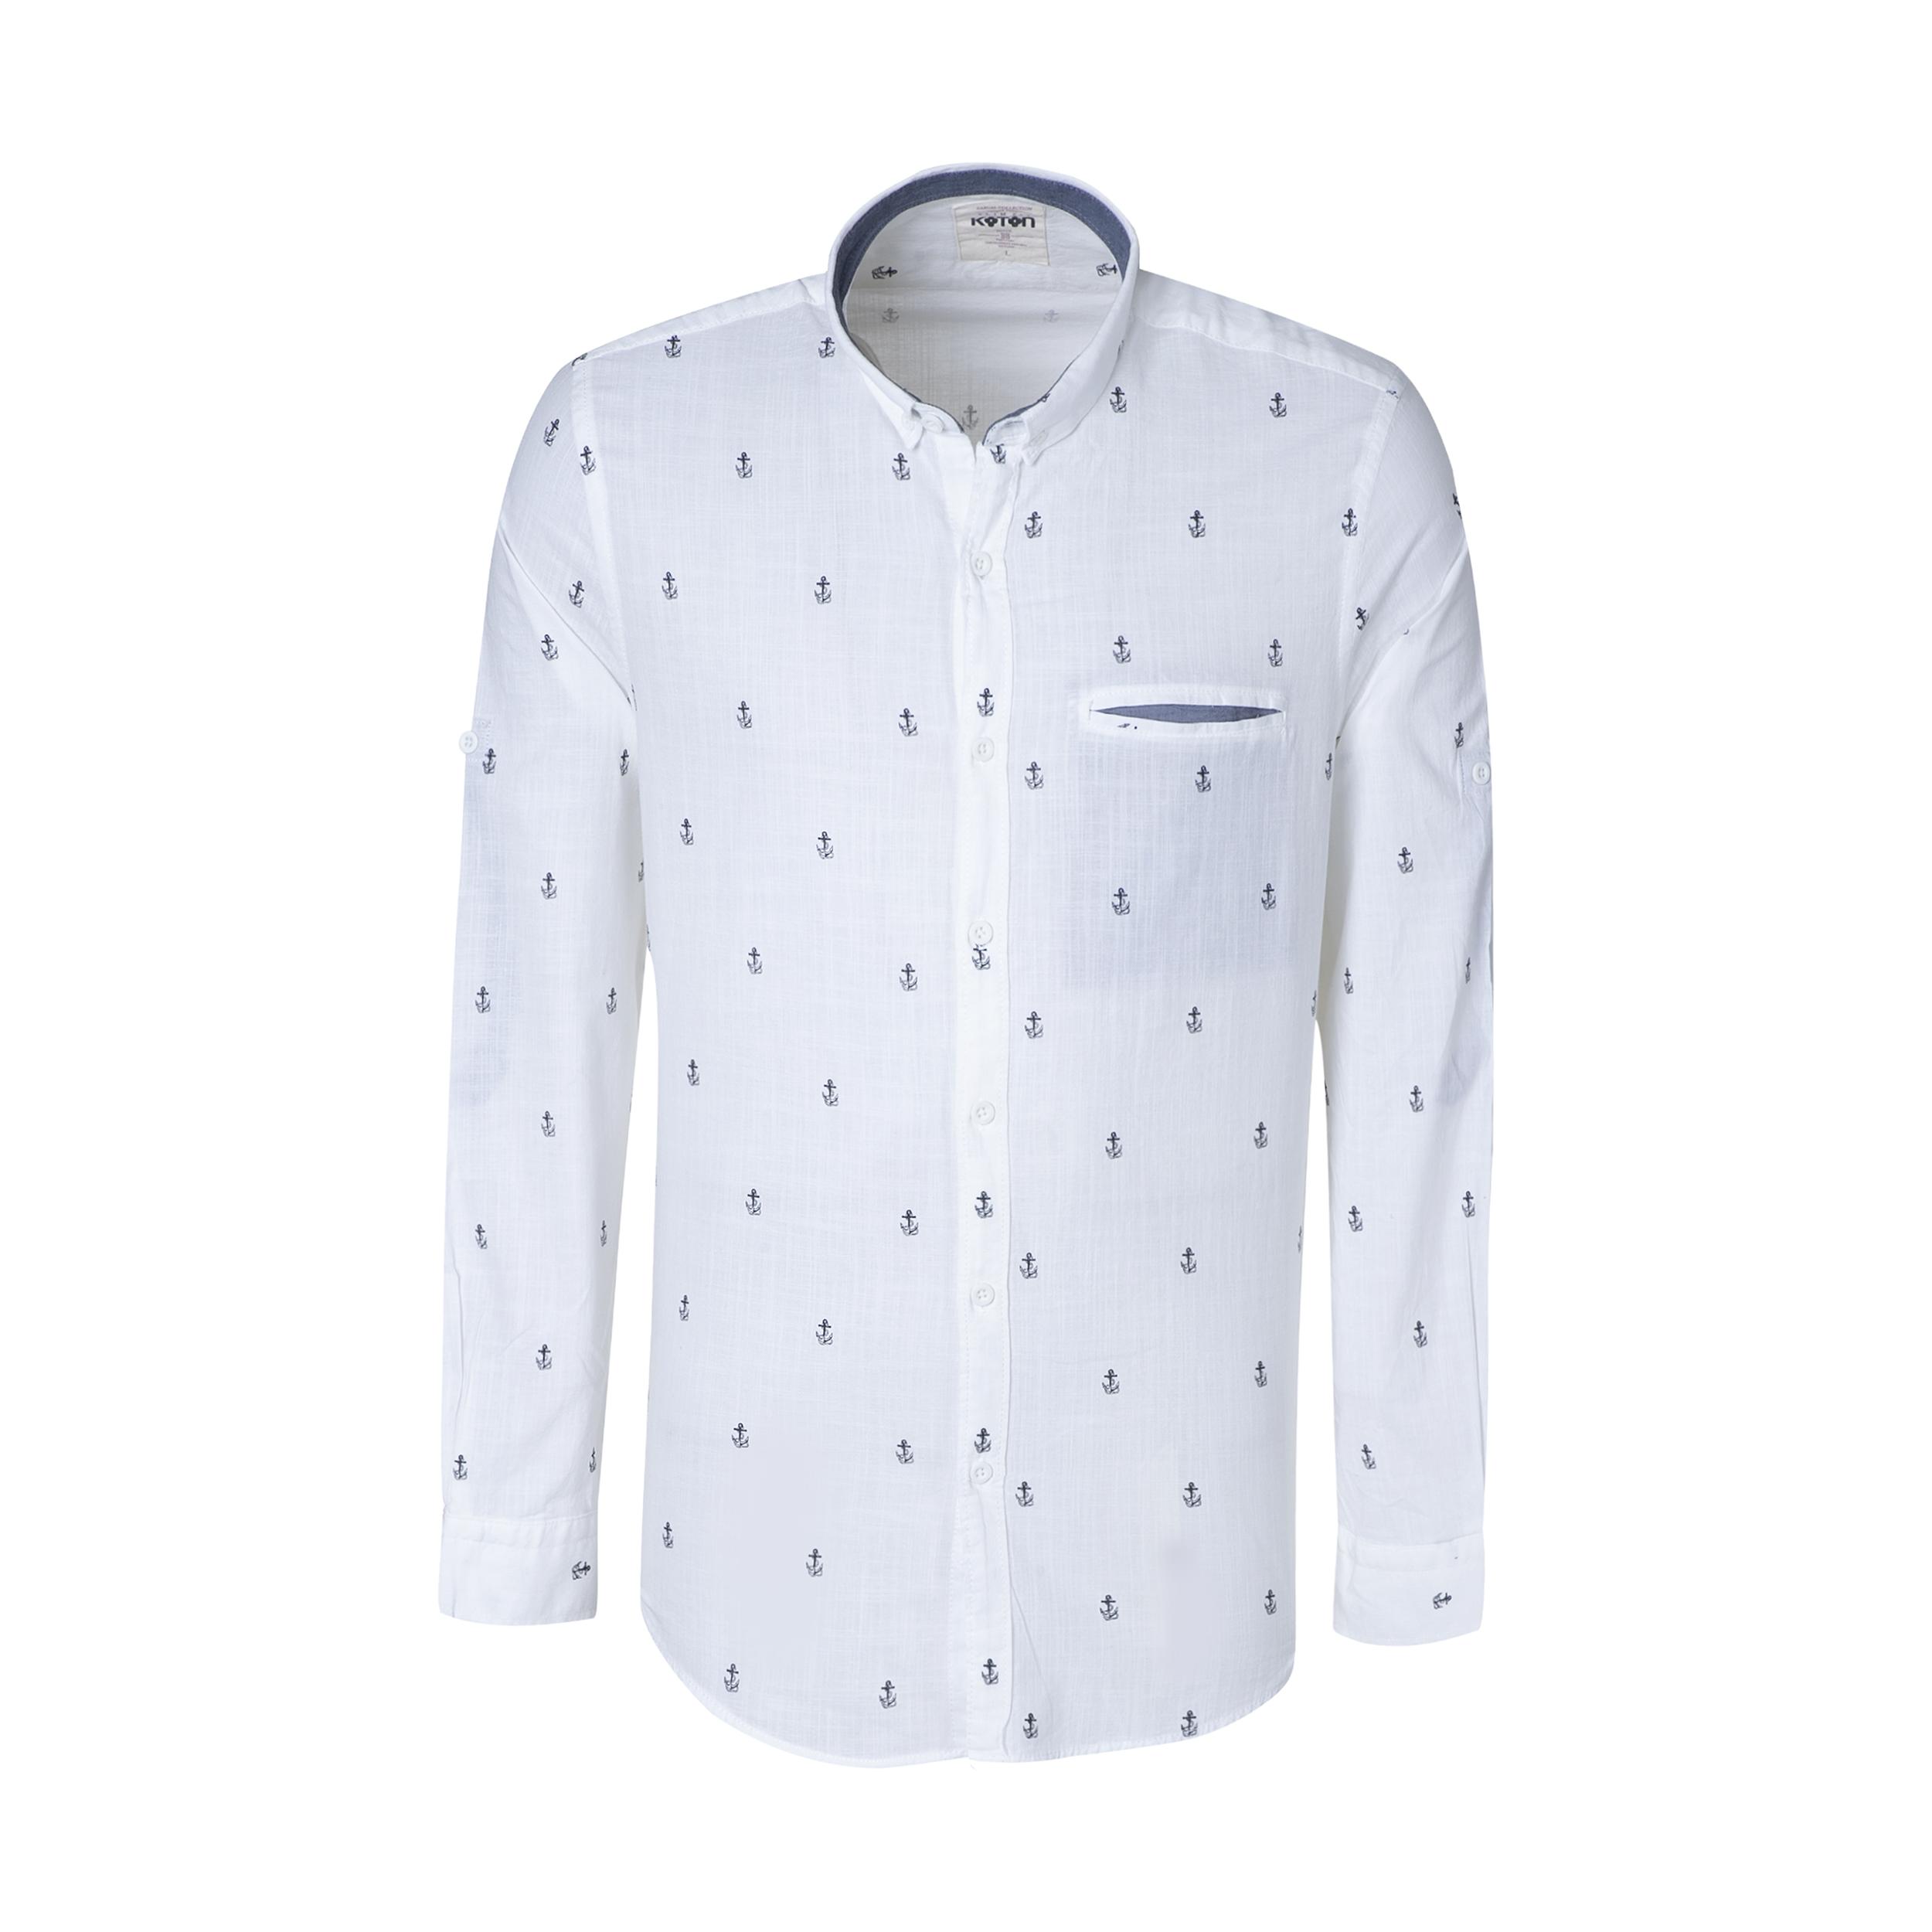 پیراهن مردانه کوتون مدل 8YAM61286LW-61C